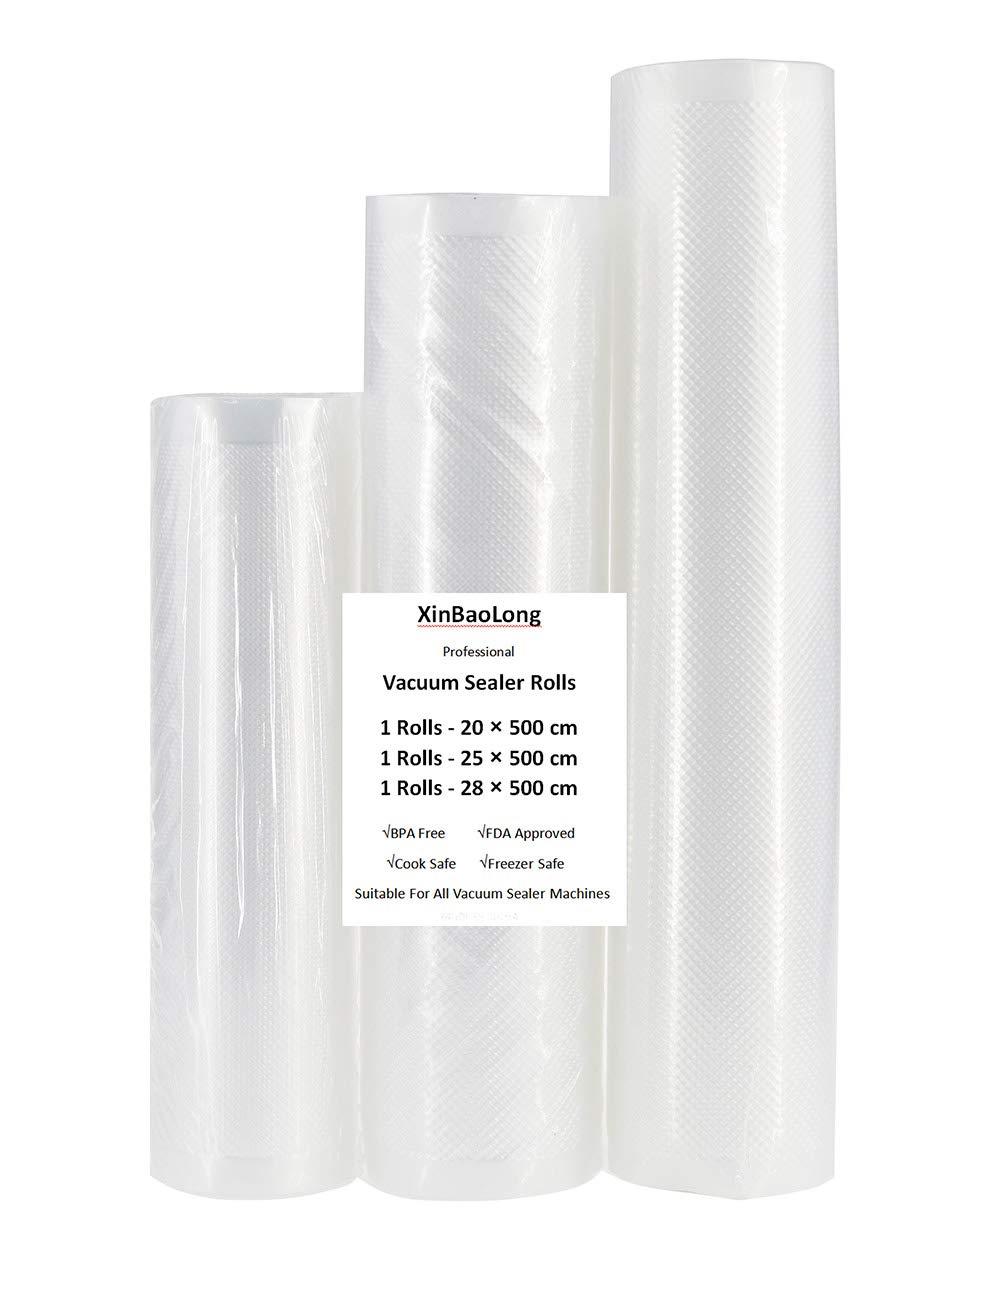 Vacuum Sealer Bags Rolls, Vacuum Food Sealer Bags for Food Saver Storage,1 Pack 20X500CM,1 Pack 25X500CM,1 Pack 28X500CM(3Rolls)